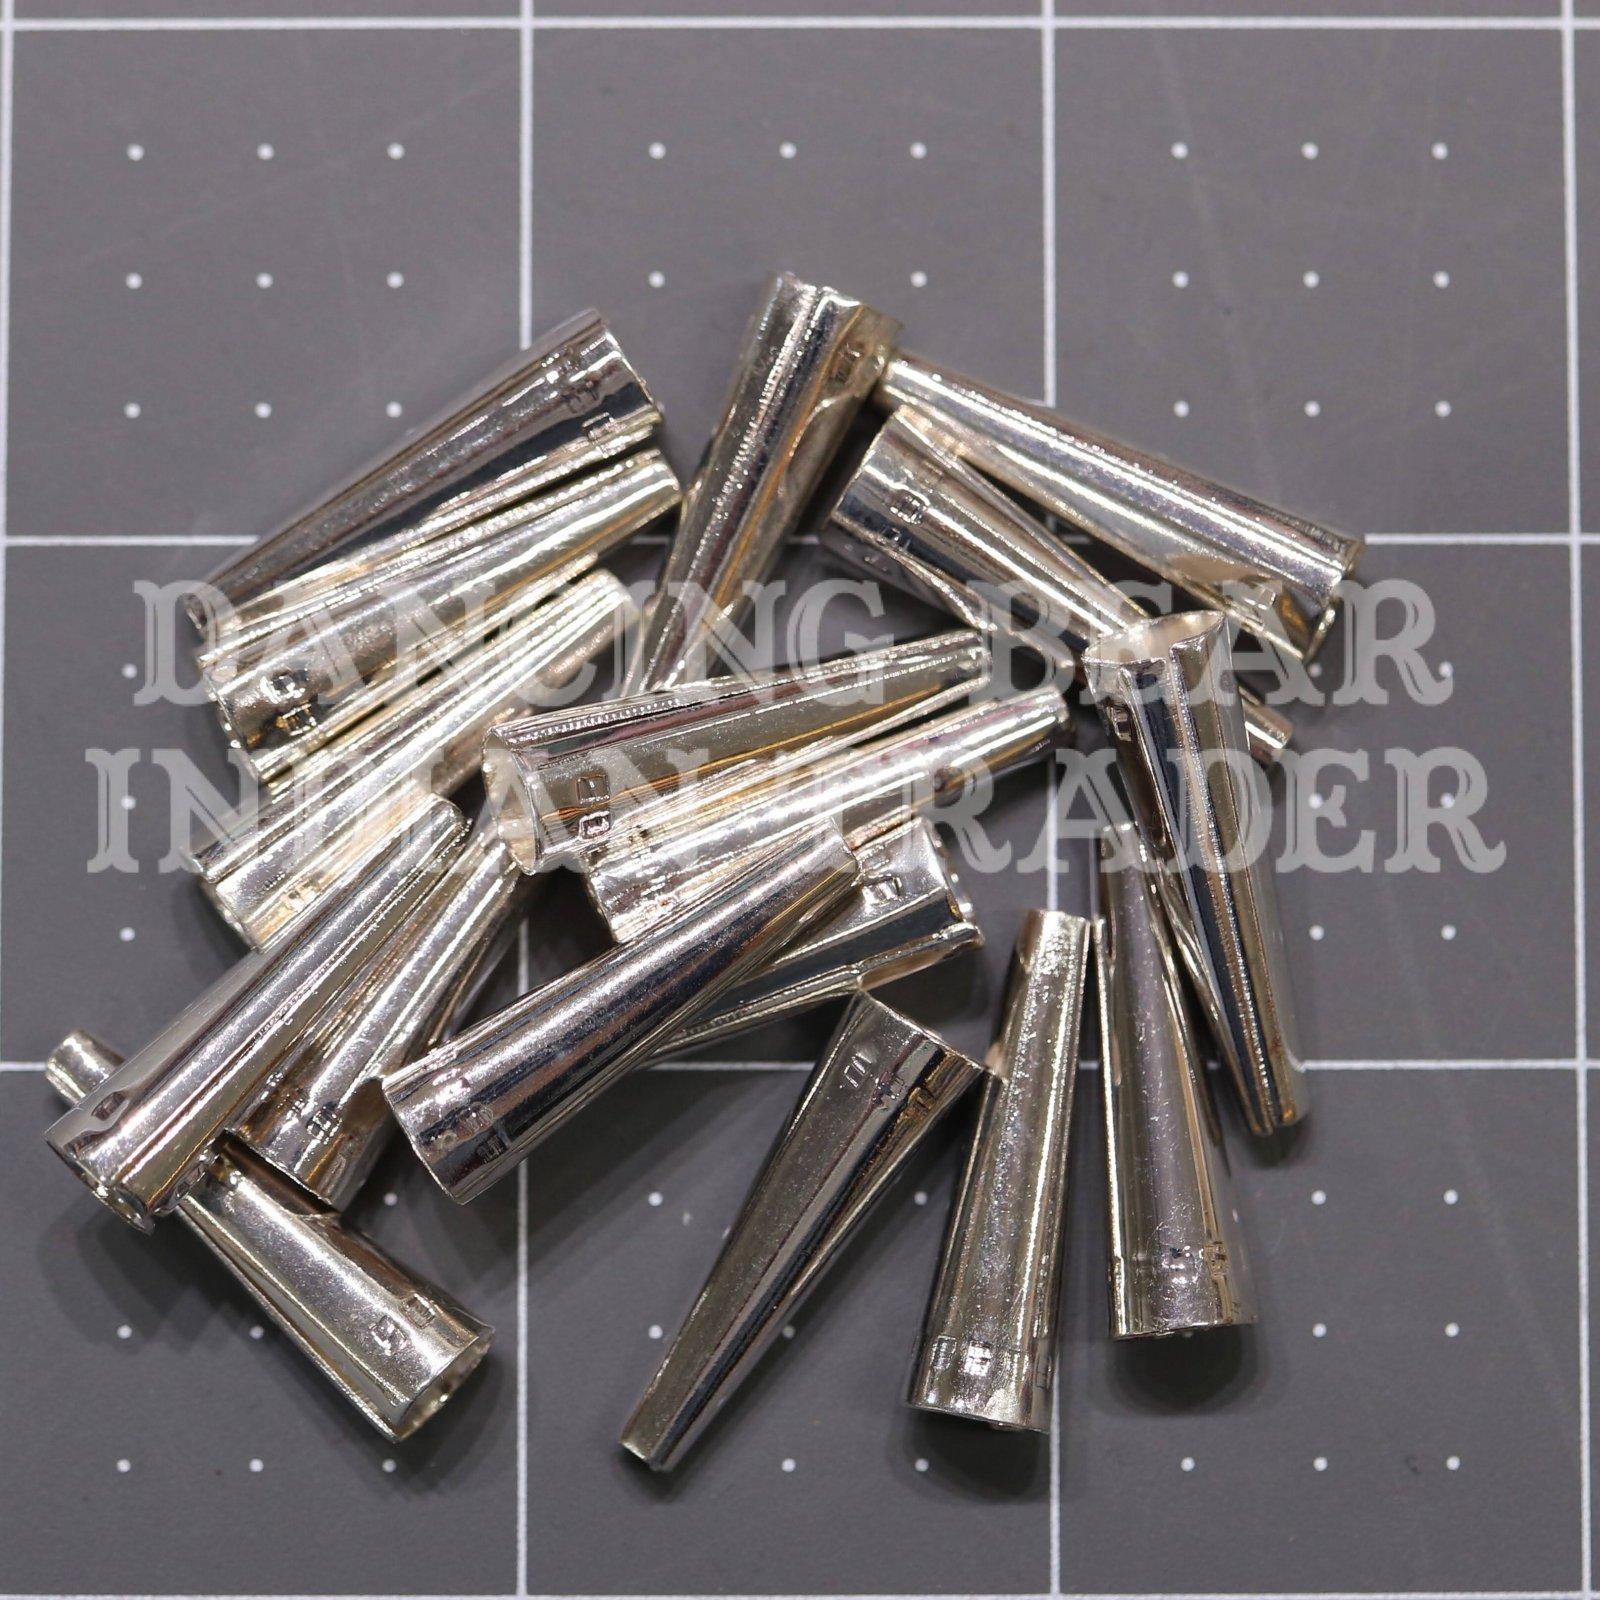 1 Silver-Plated Cones 100pcs Bulk